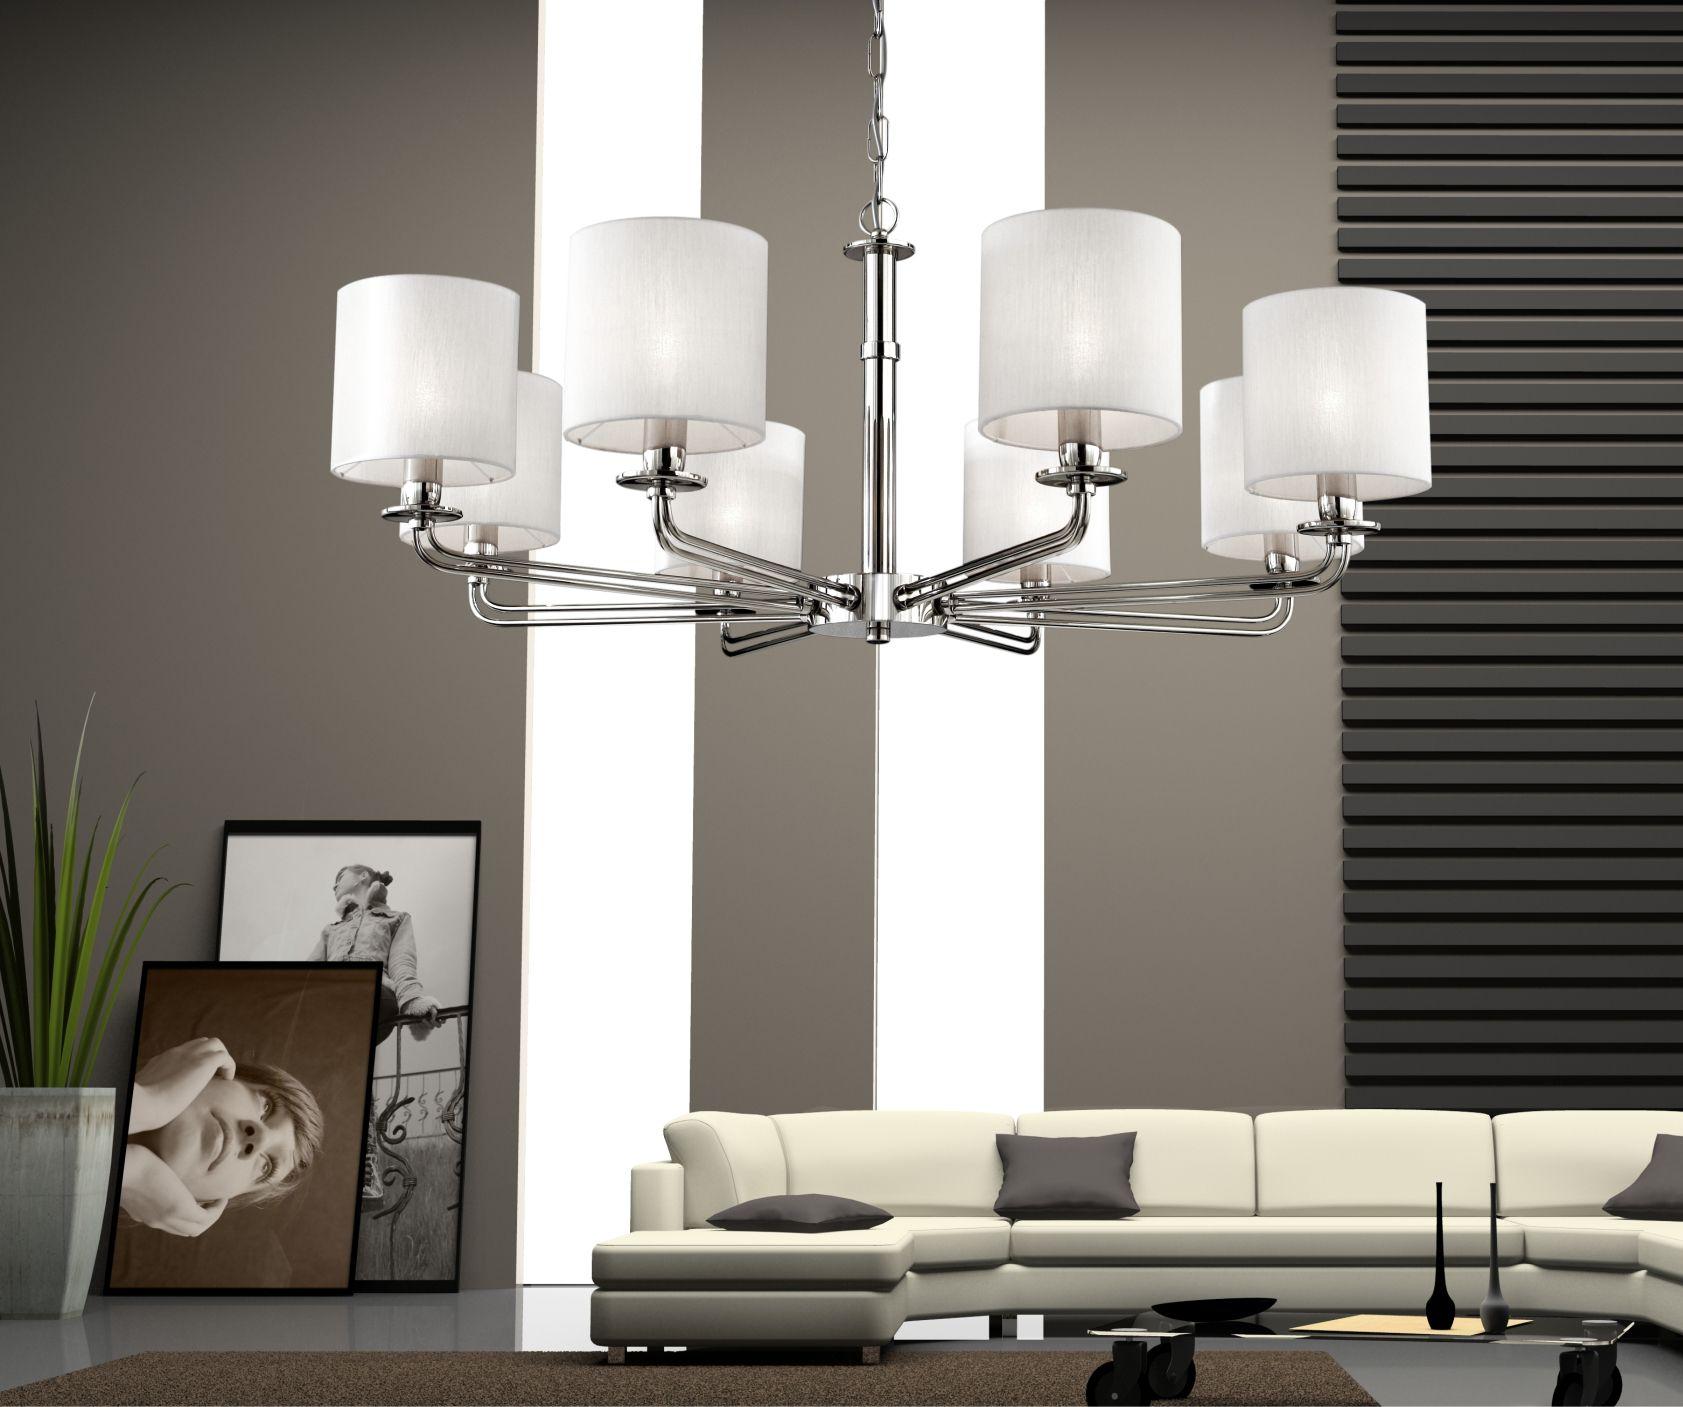 San Diego Celing Lamp By Castro Lighting Decor Lighting Interiors Home Luxury Lighting Living Room Inspiration Ceiling Lamp